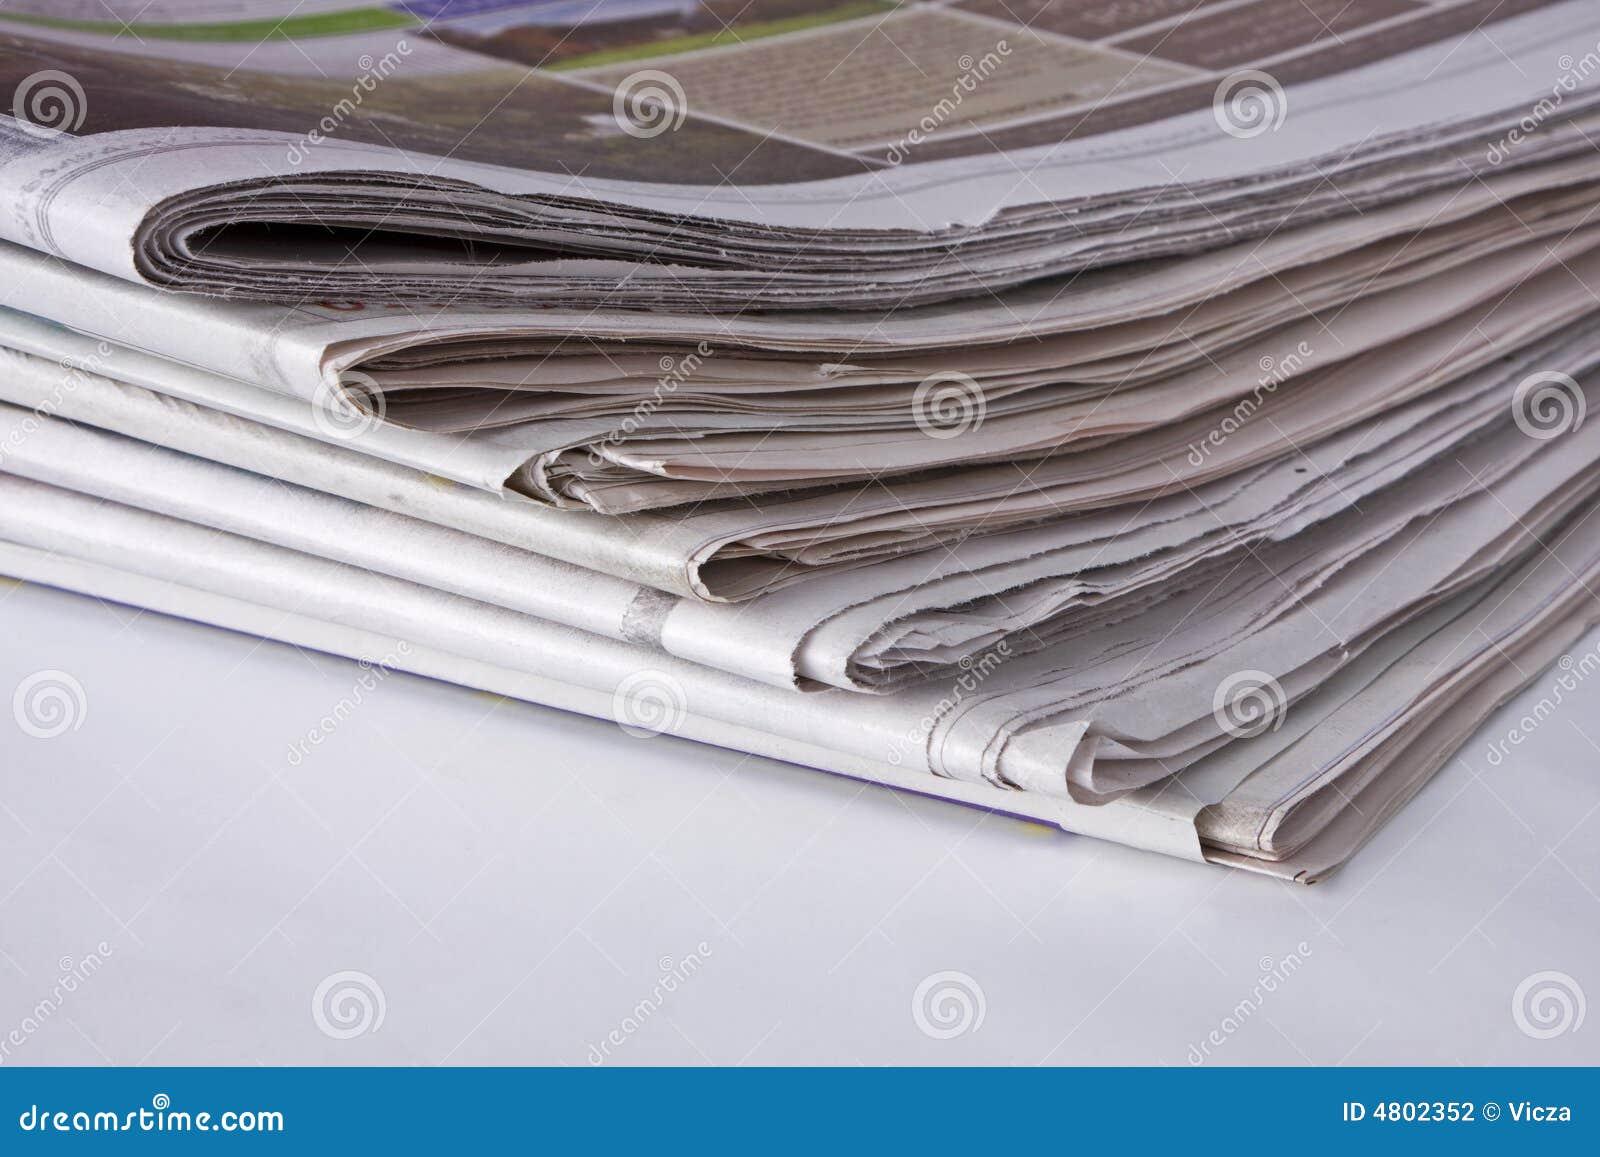 Periódicos - pila de la esquina inferior